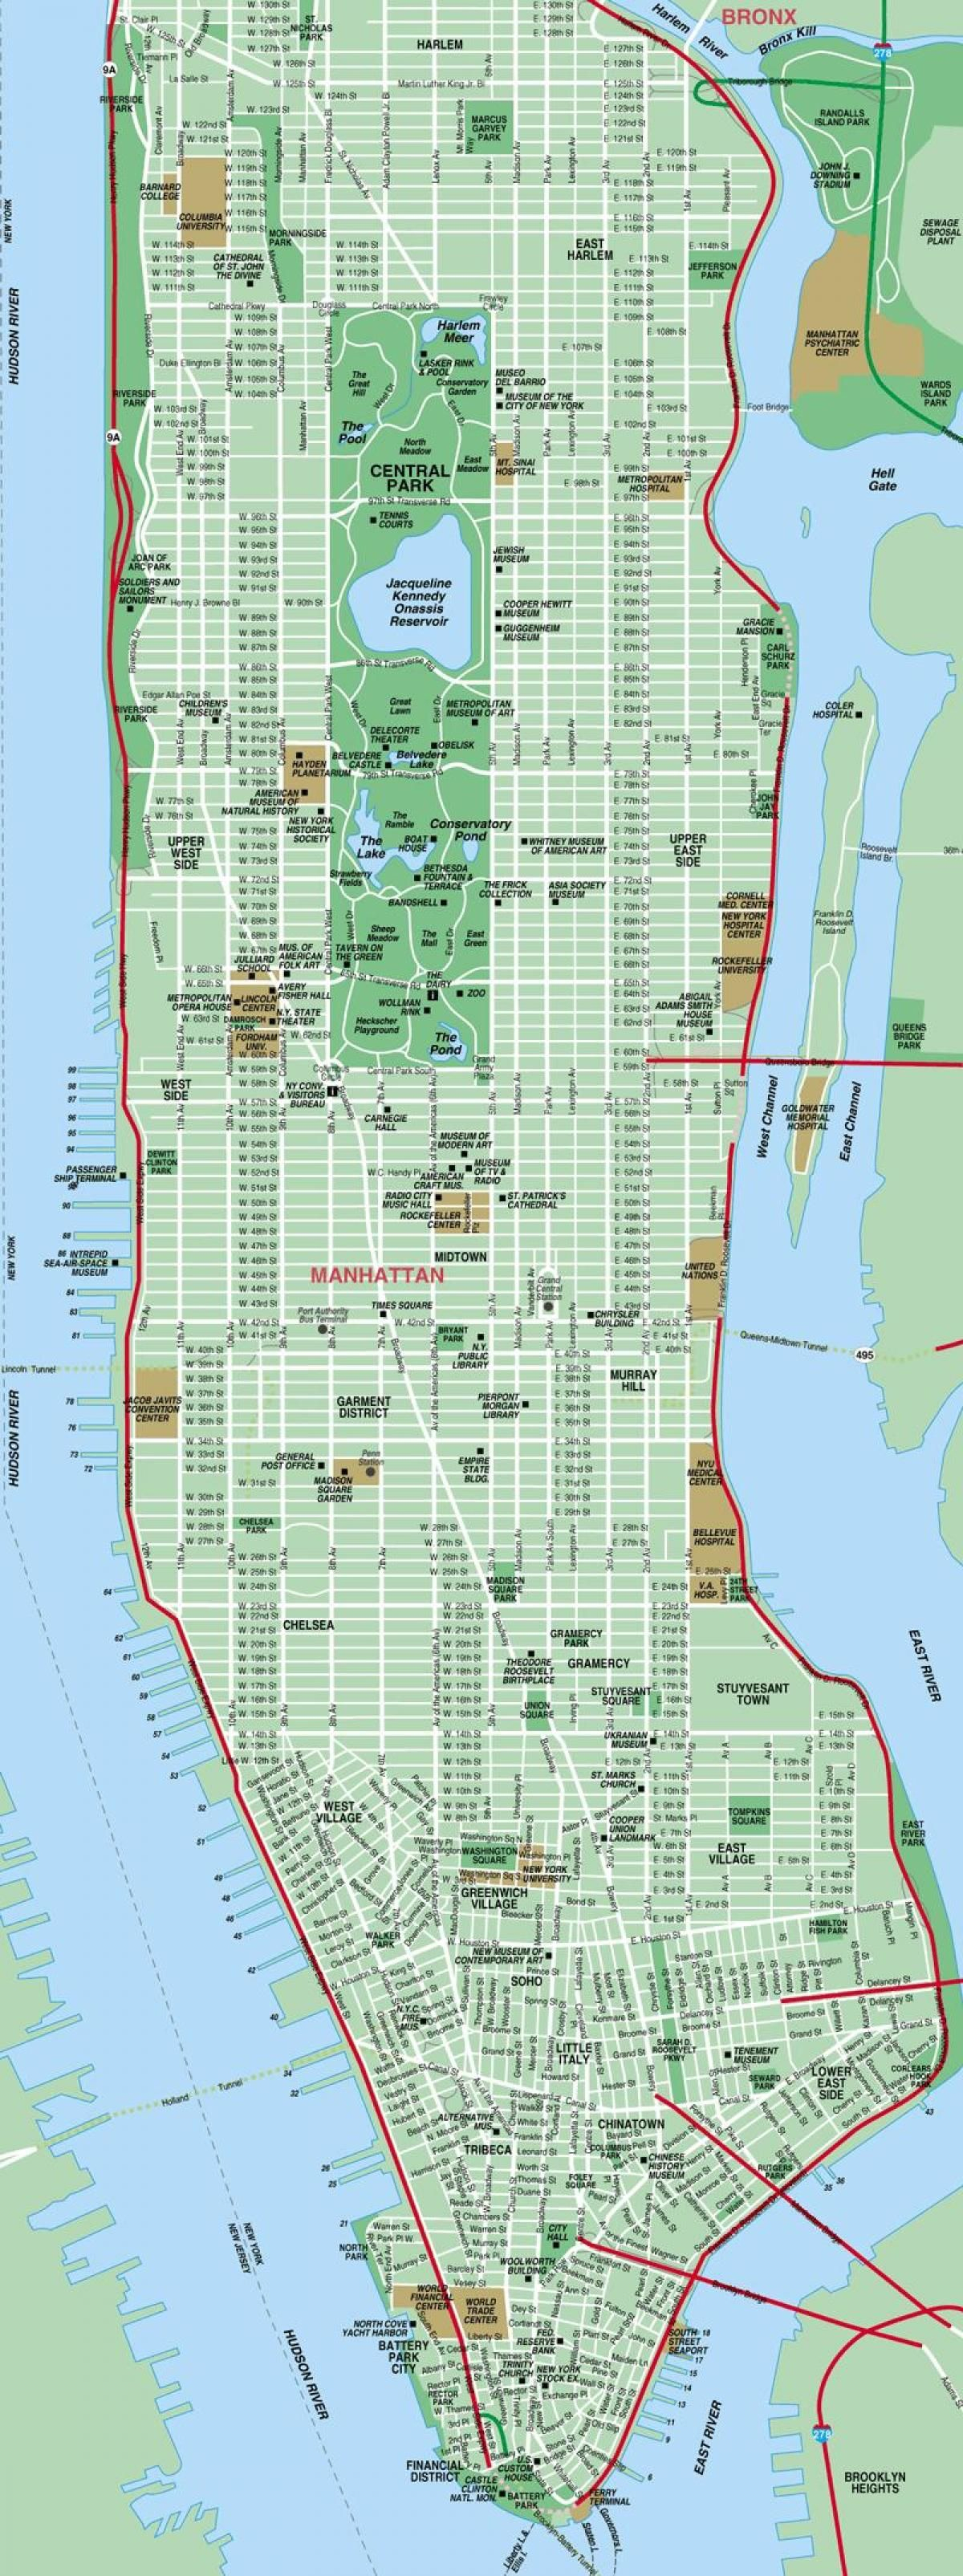 Manhattan Street Map At Printable Manhattan Street Map | Manhattan - Printable Street Map Of Manhattan